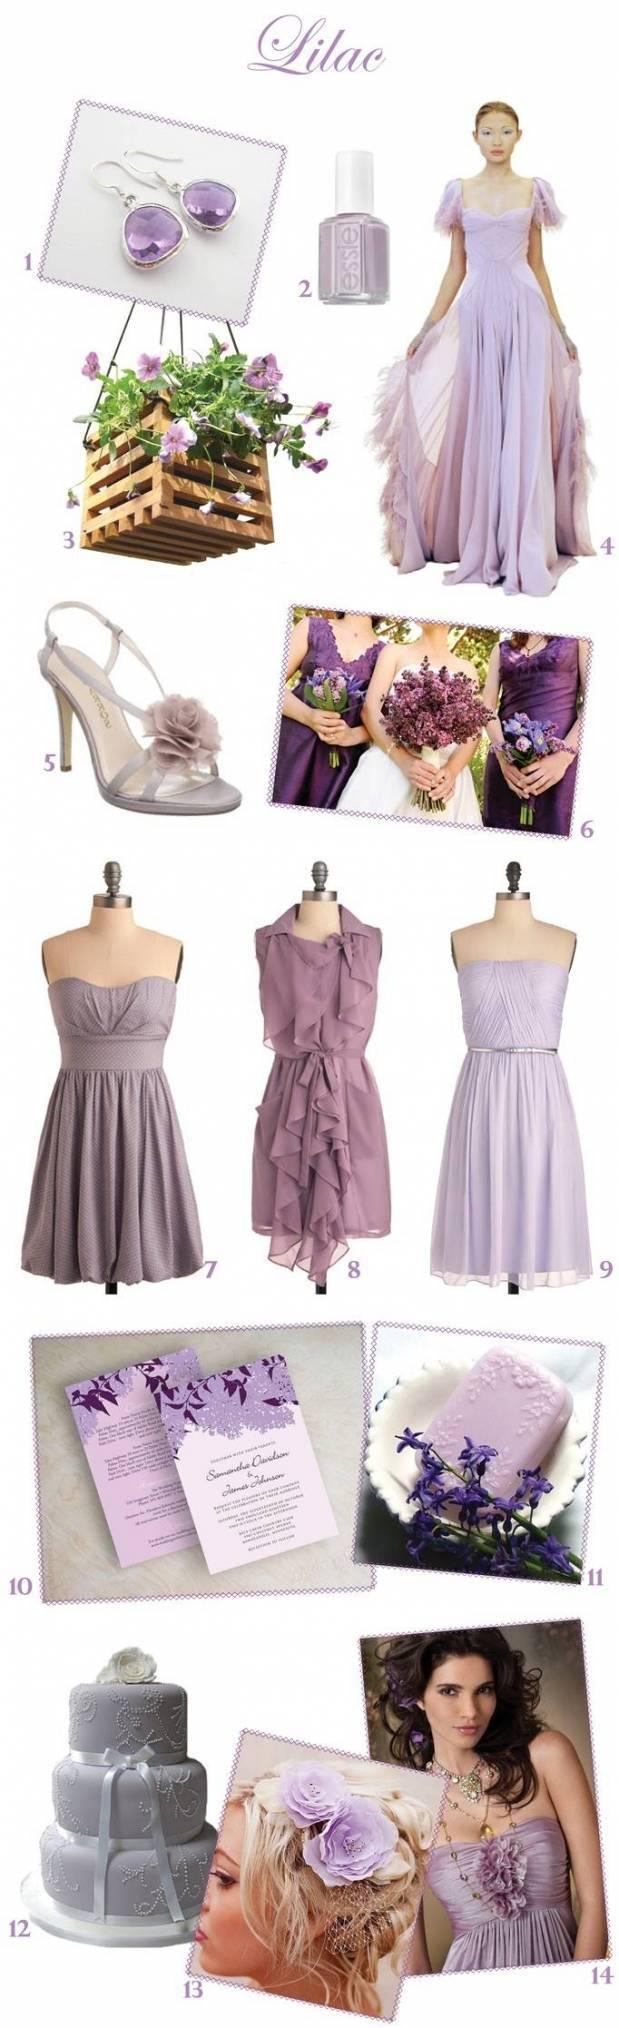 Lilac Wedding Inspiration